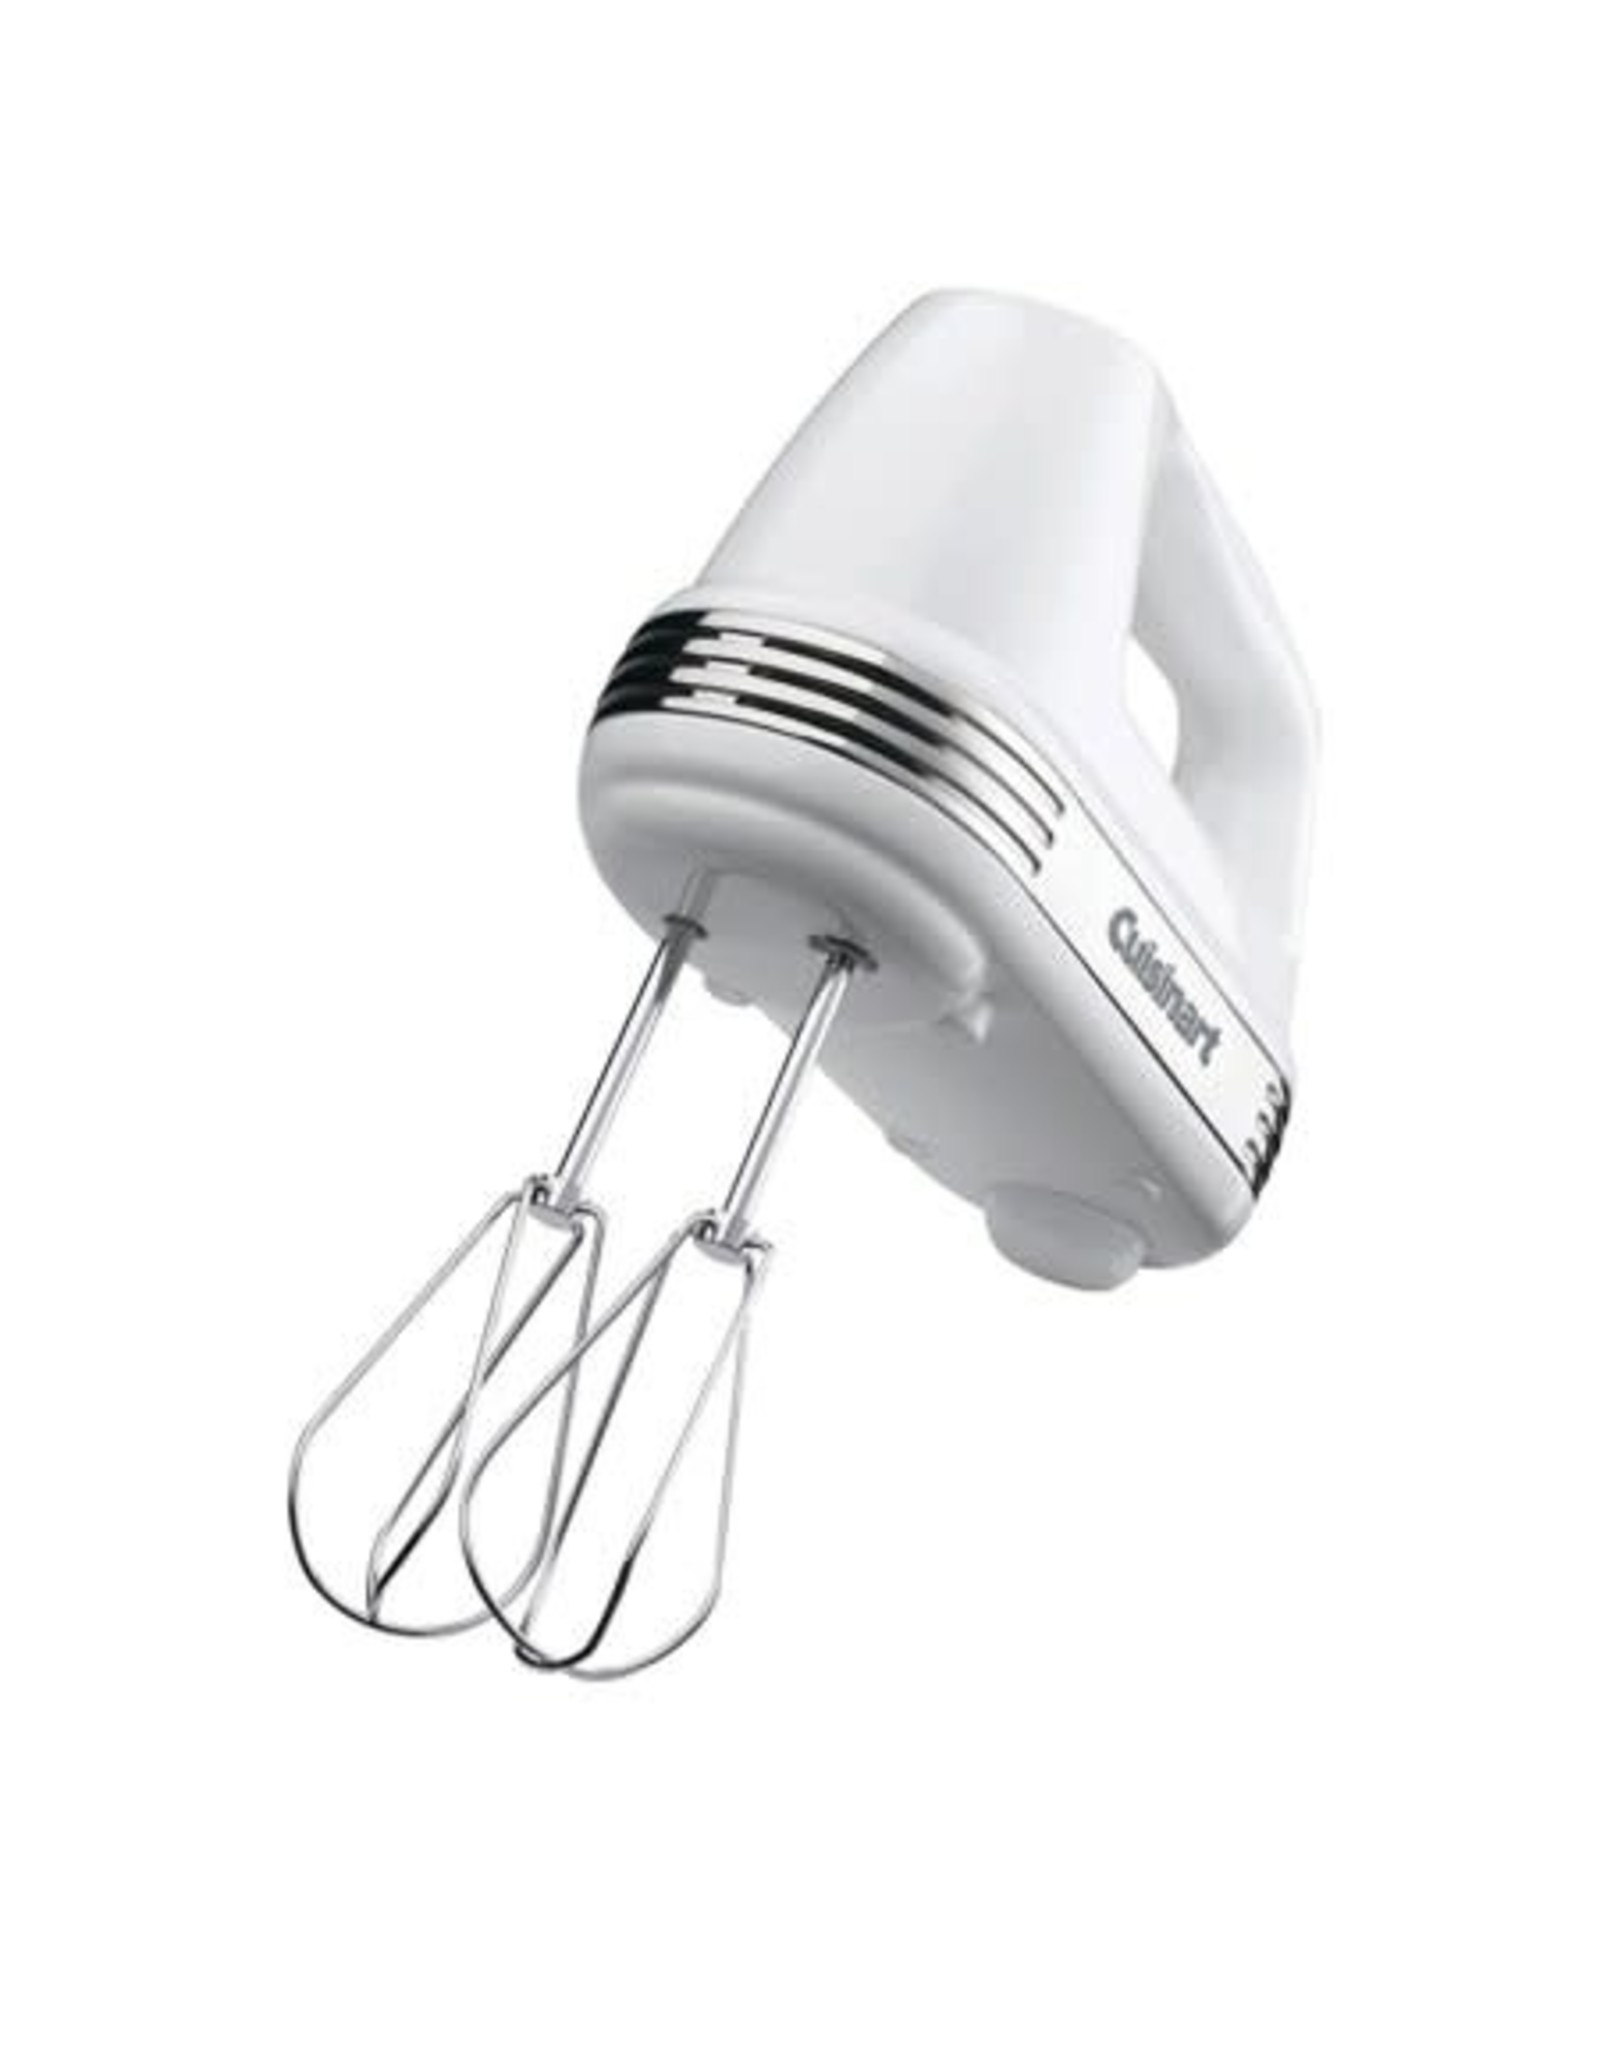 Cuisinart Hand Mixer Power Advantage White 5 speed CUISINART